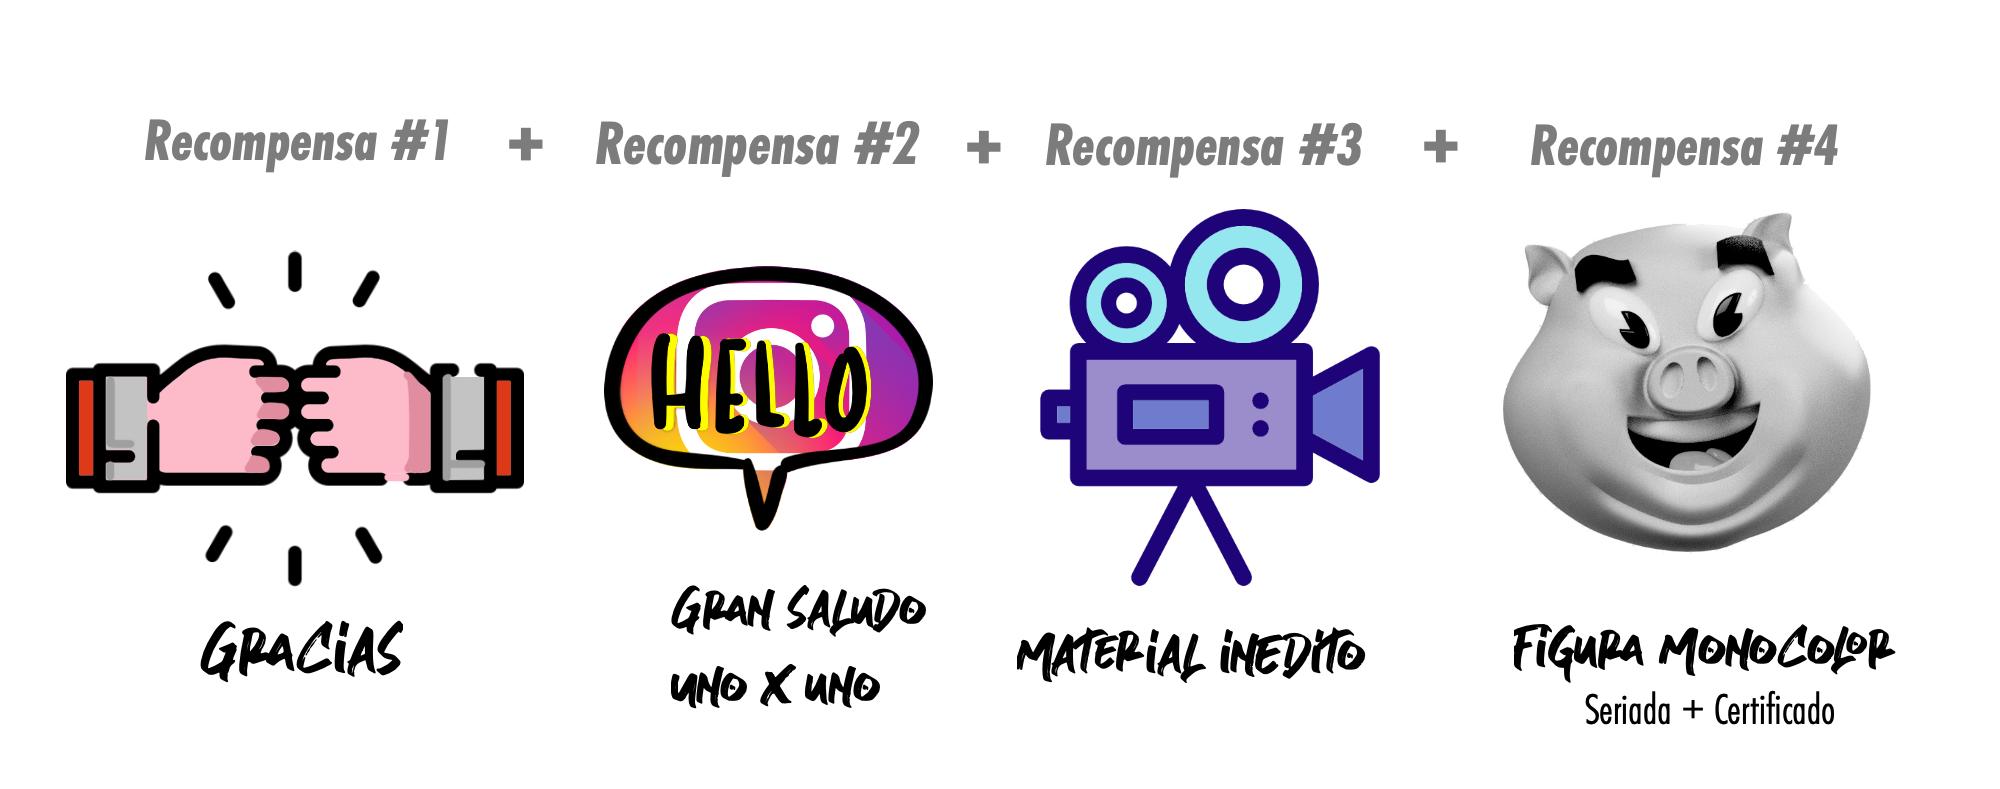 recompensas_combinadas_1.png